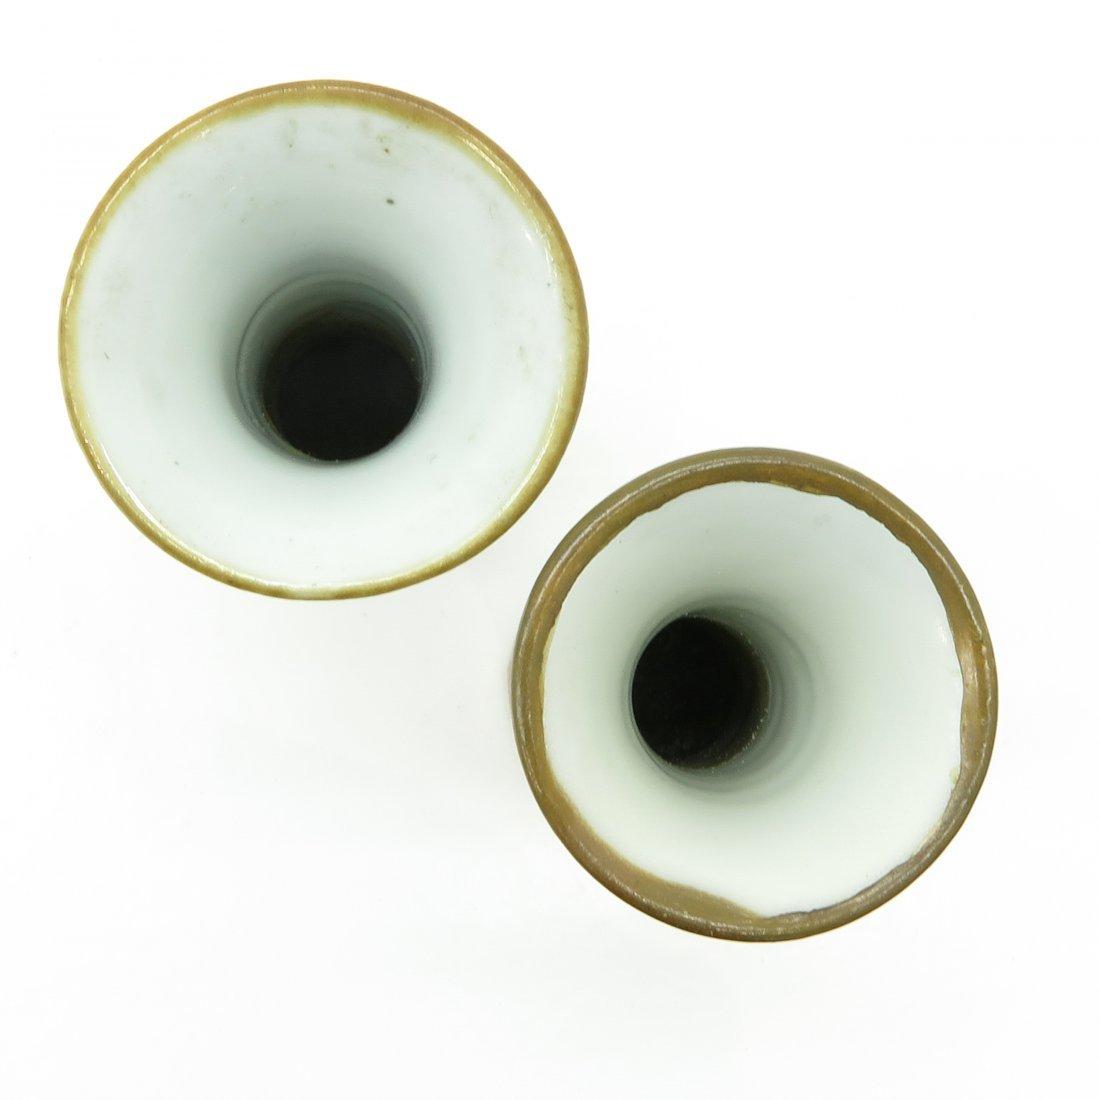 Lot of 2 China Porcelain Miniature Vases - 5